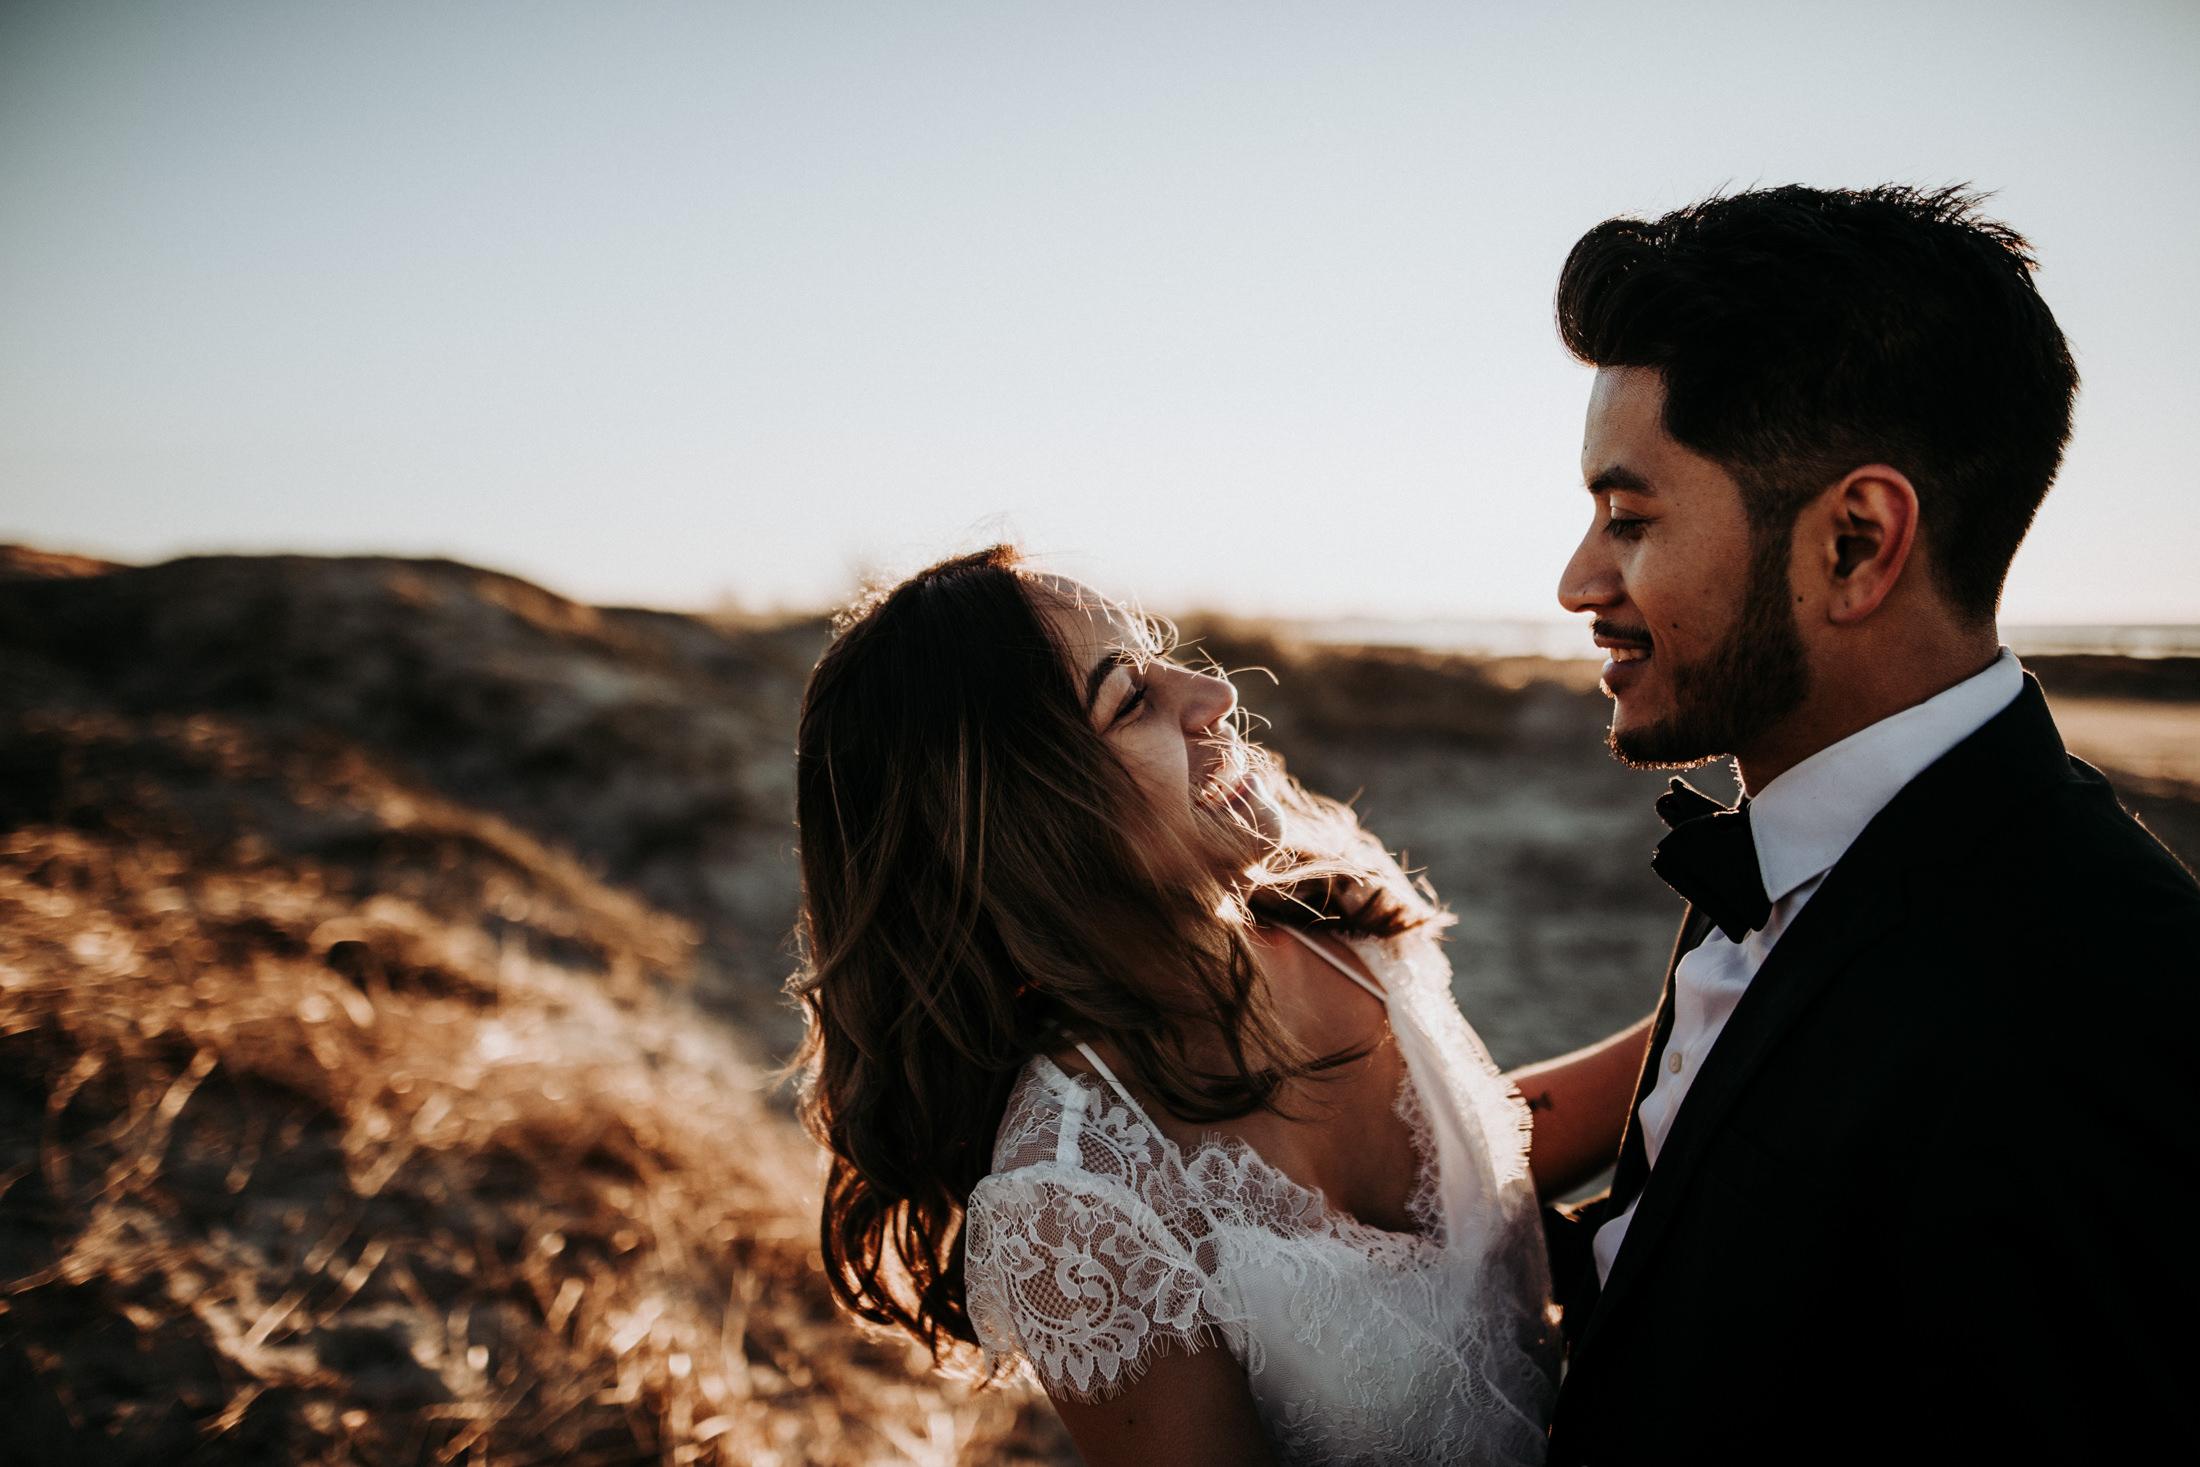 Wedding_Photographer_Mallorca_Daniela-Marquardt_Photography_CanaryIslands_Lanzarote_Iceland_Tuskany_Santorini_Portugal_Schweiz_Austria_Bayern_Elopement_Hochzeitsfotograf_Norddeichich_33